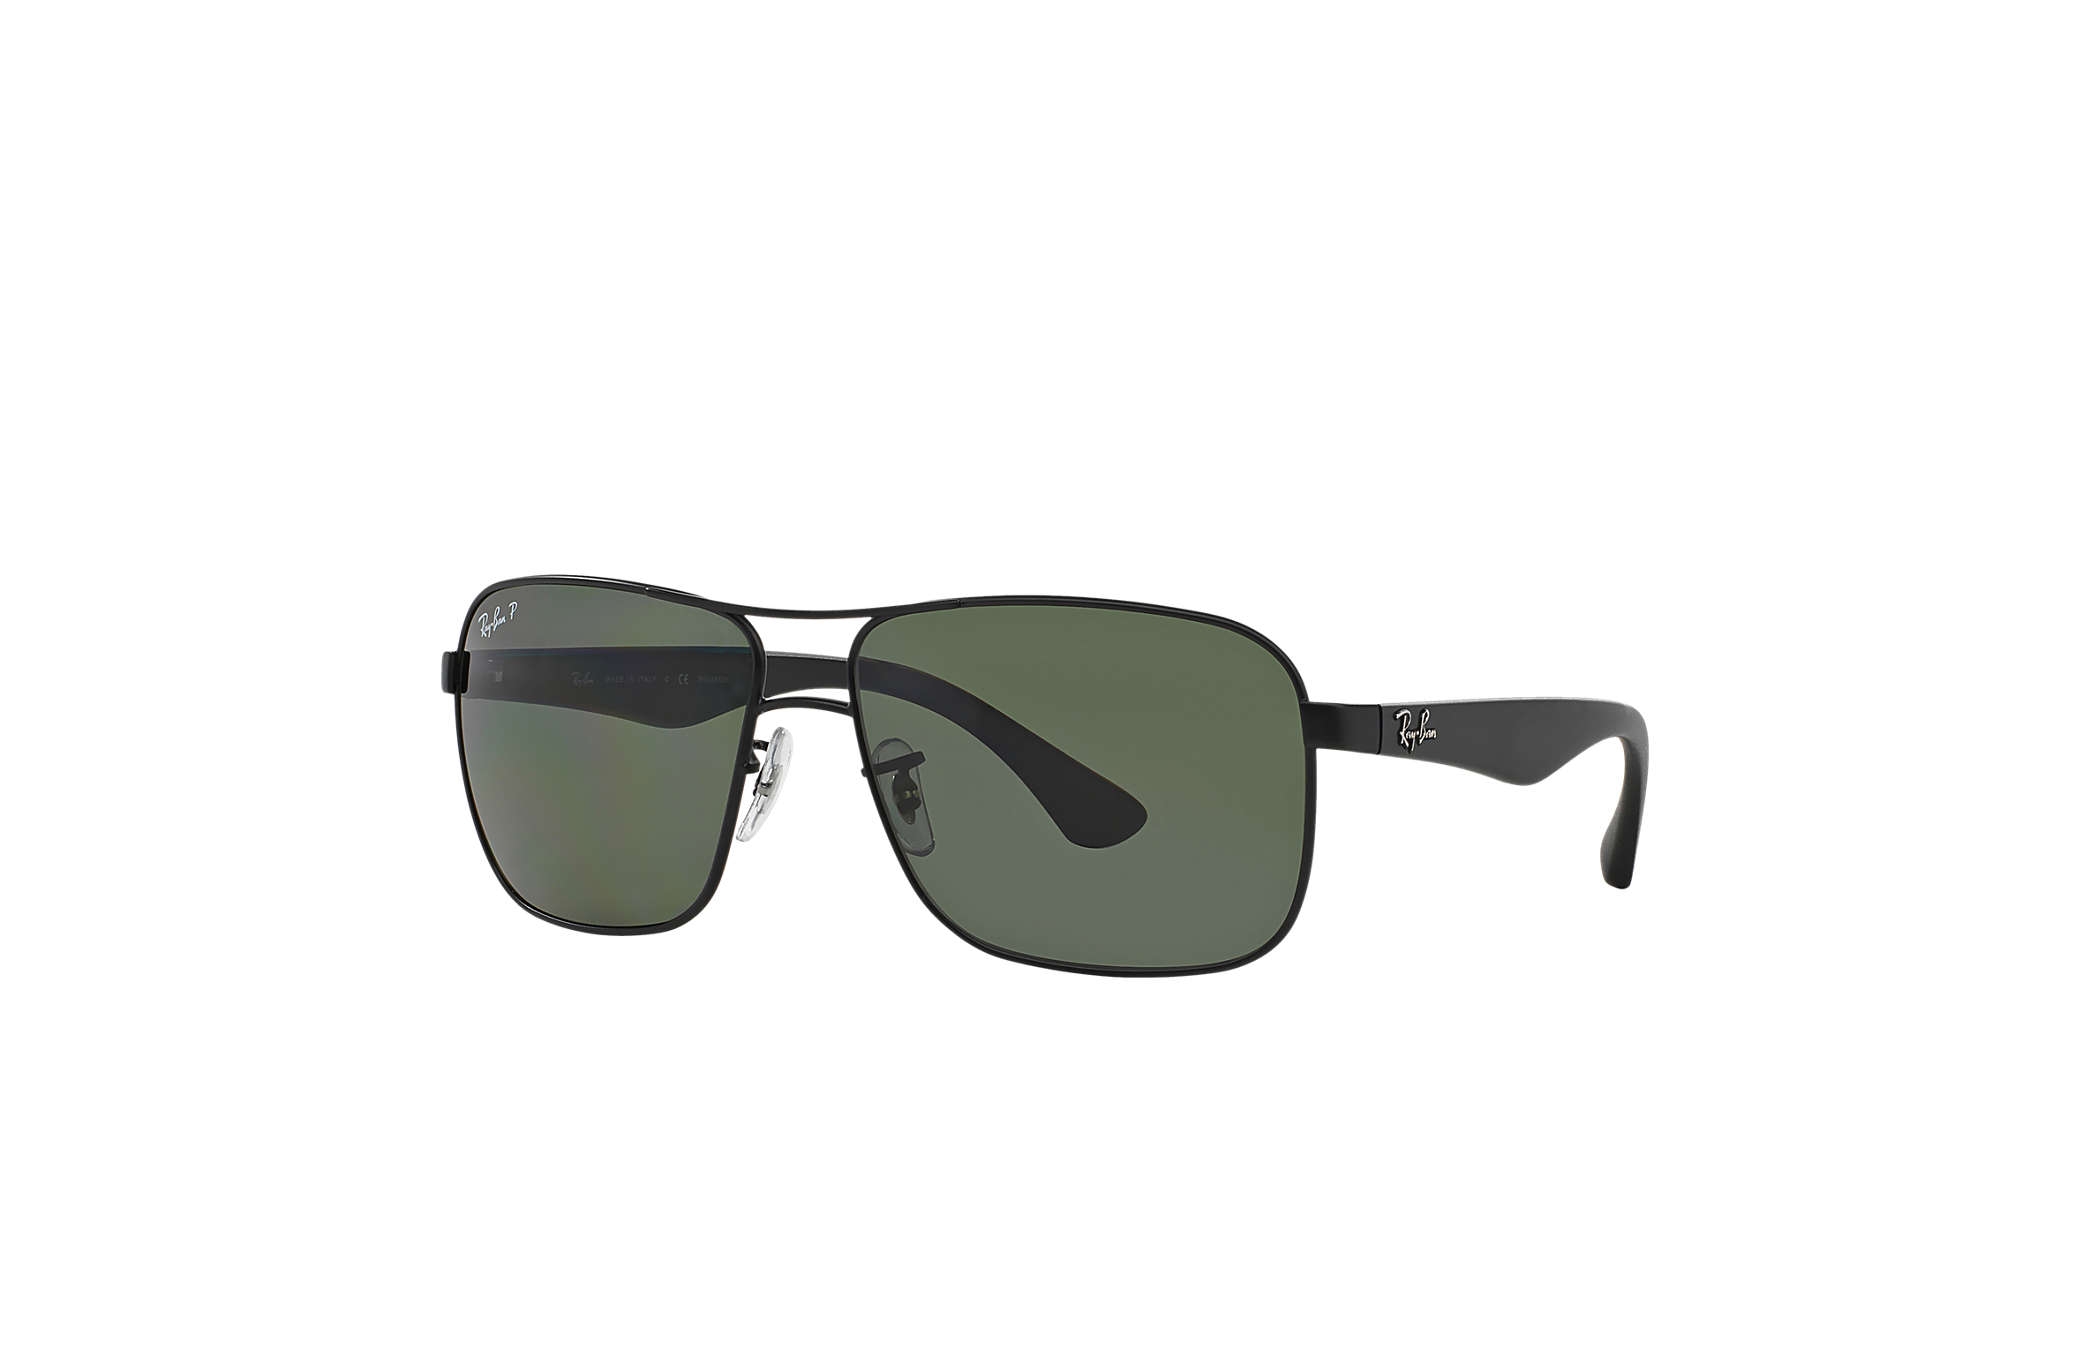 cab691f4fc4 Ray-Ban RB3516 Black - Metal - Green Polarized Lenses - 0RB3516006 ...